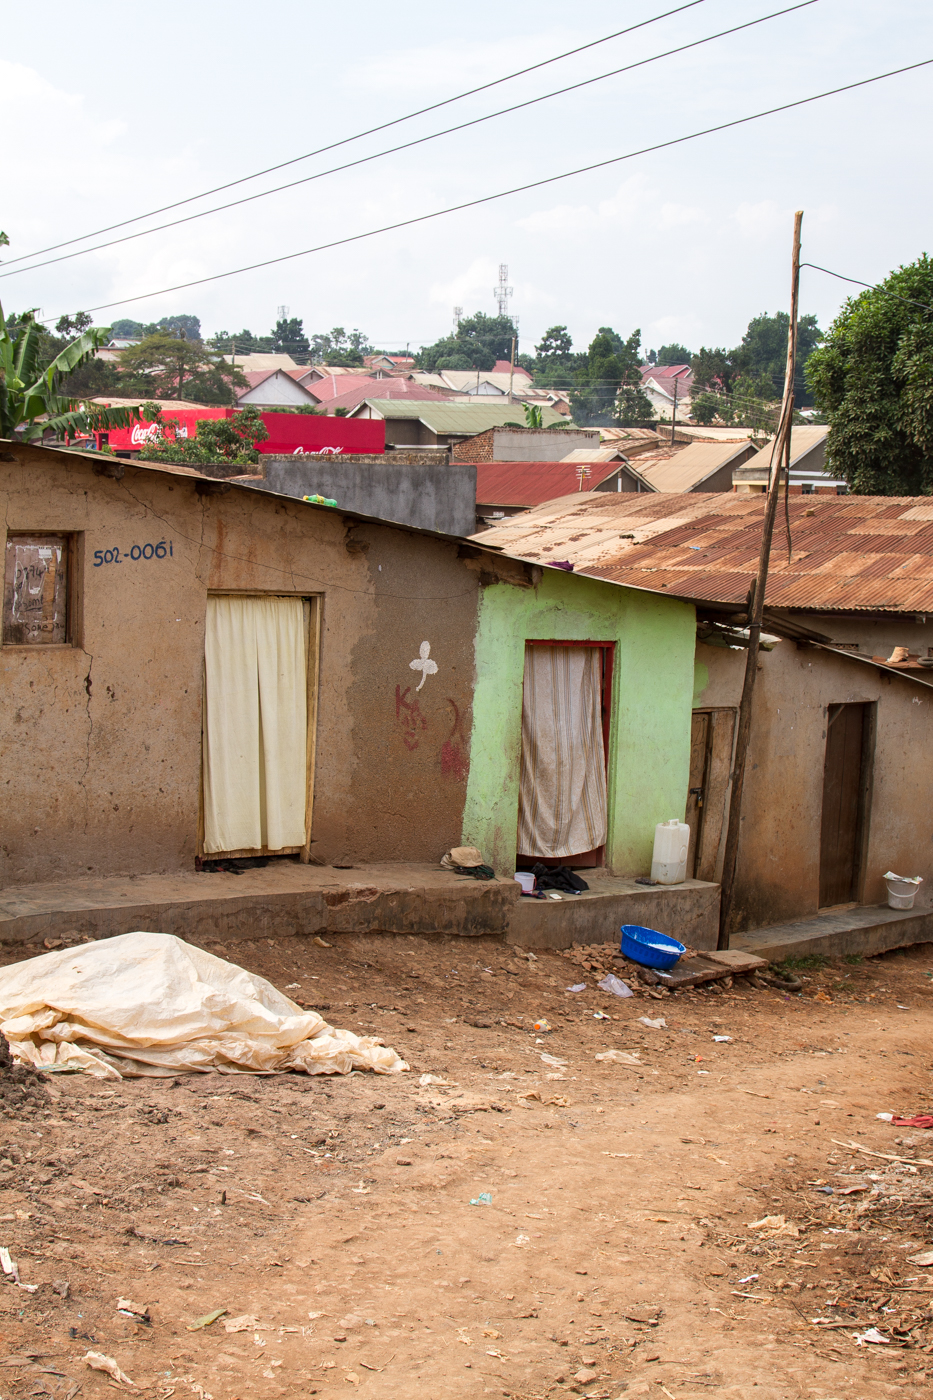 Adam Dickens Photography 2014 - Deki Uganda 447.jpg